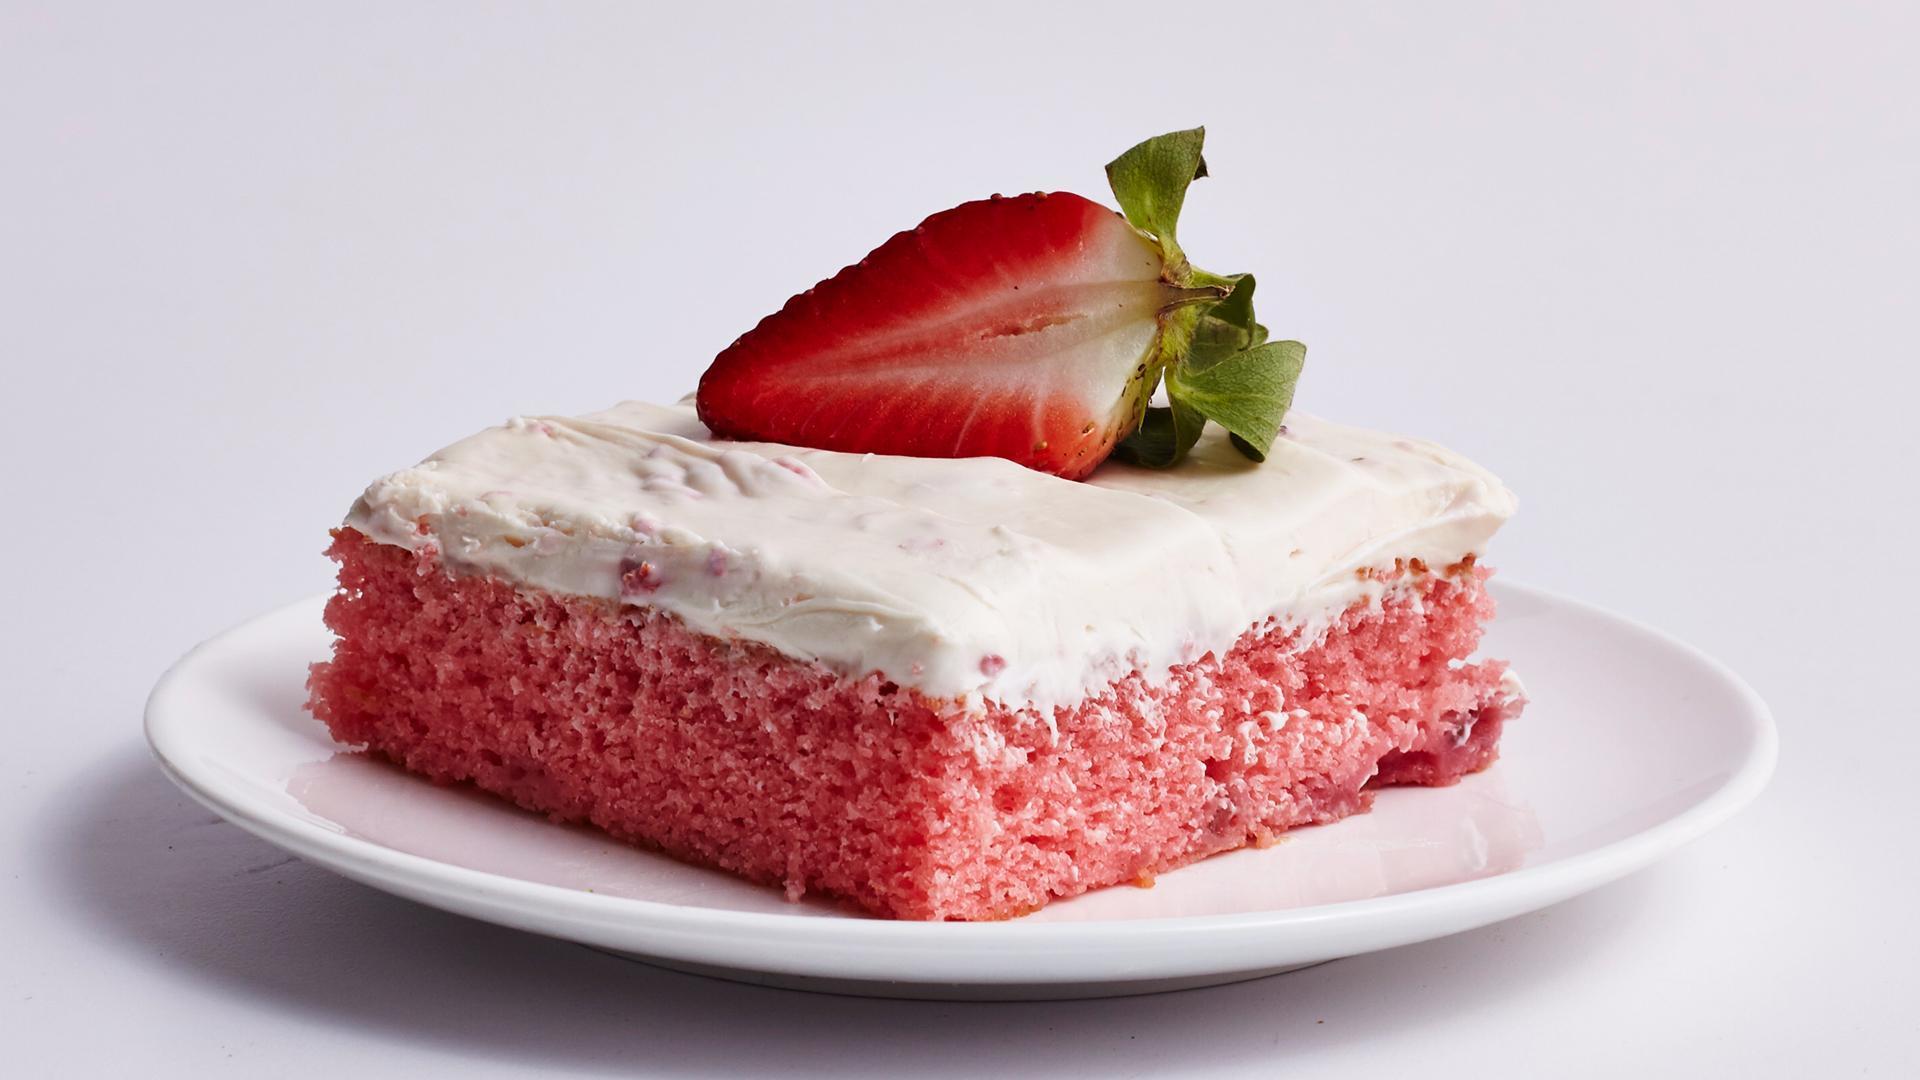 How to Make Fresh Strawberry Sheet Cake